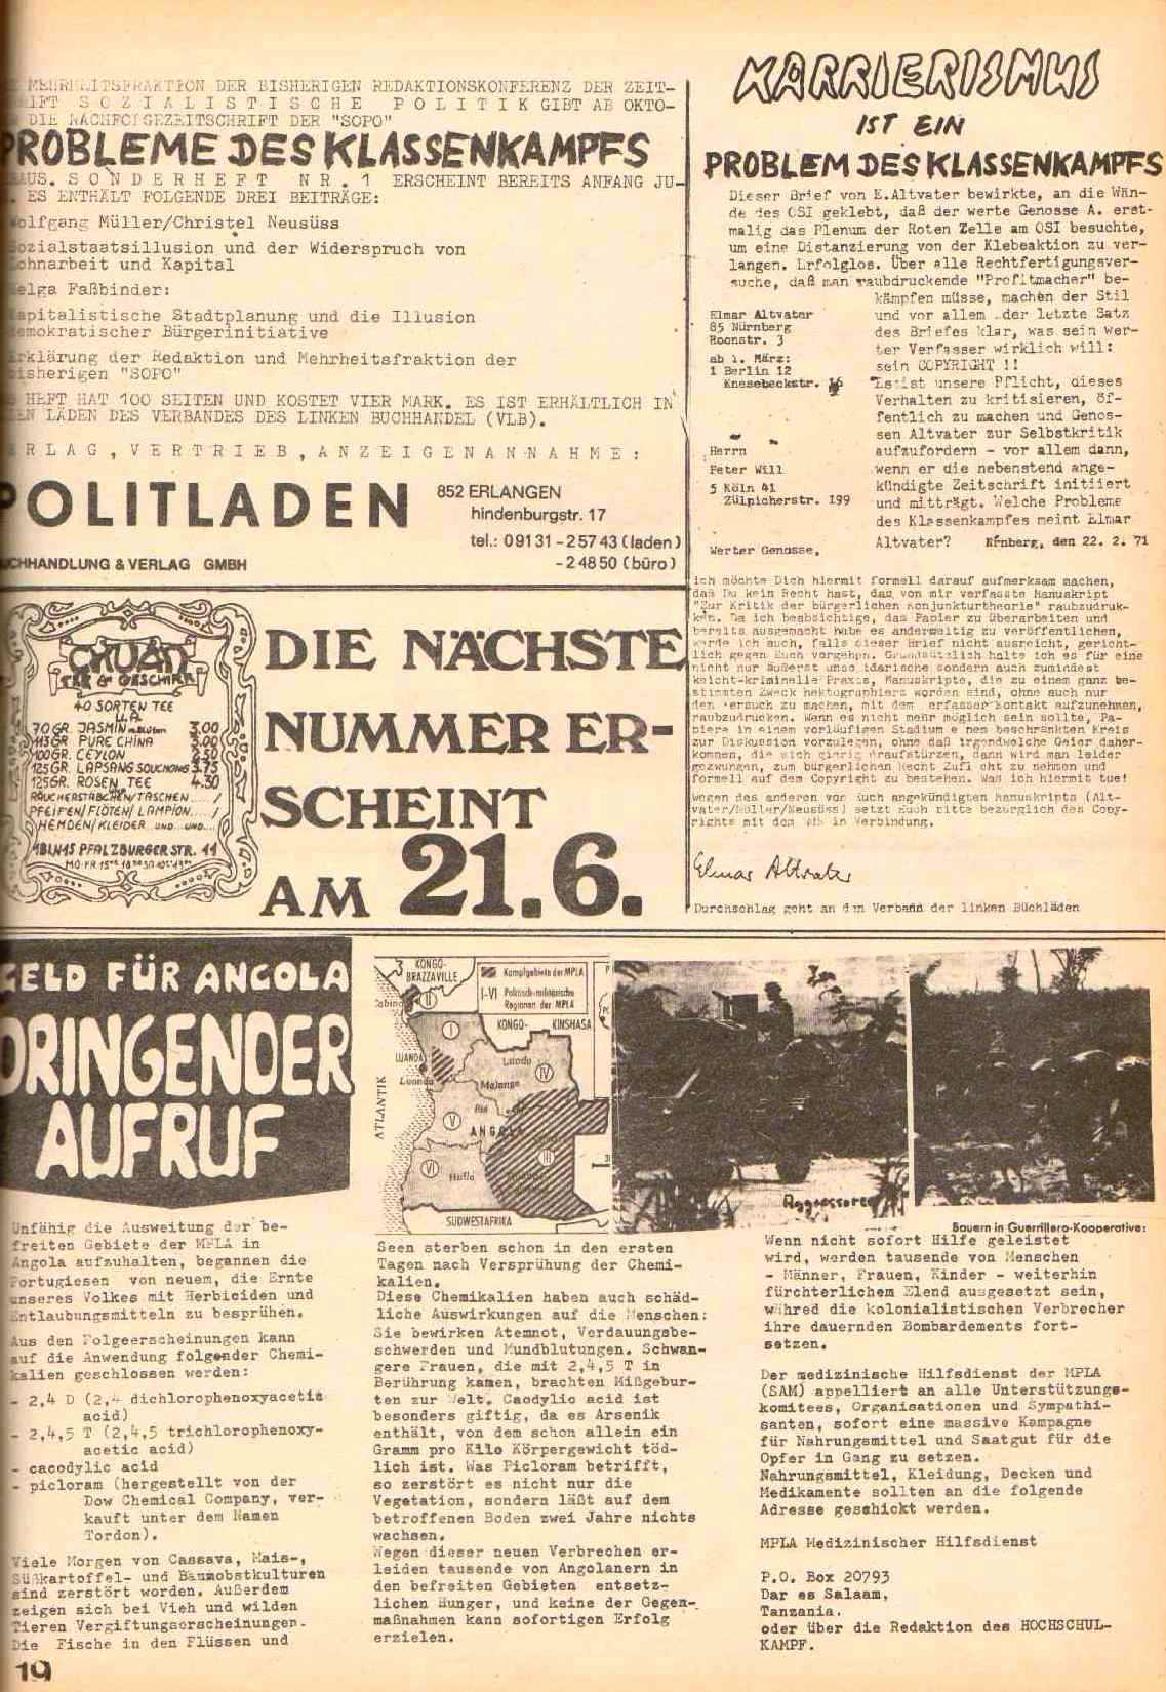 Berlin_Hochschulkampf_1971_09_19